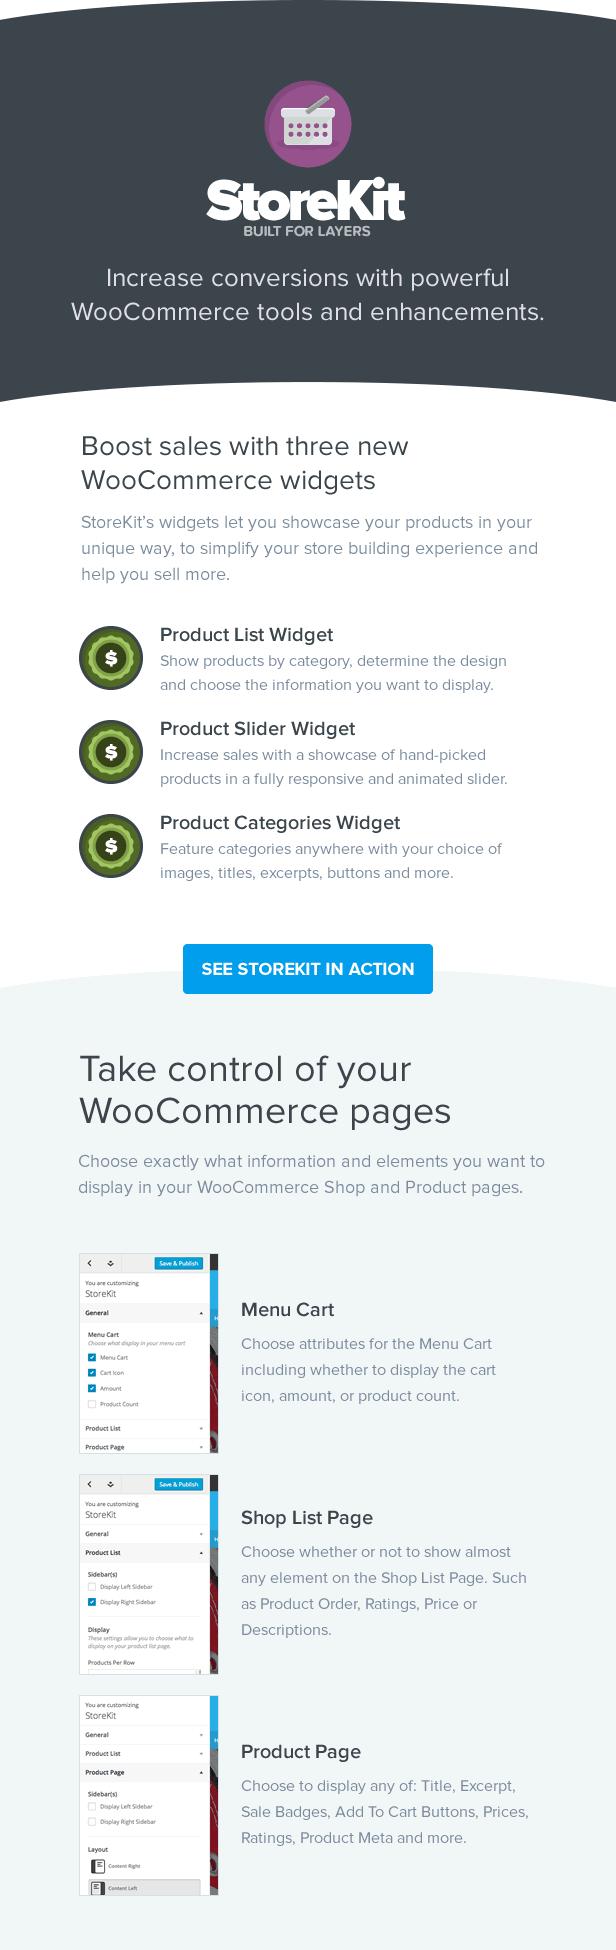 StoreKit - WooCommerce for Layers